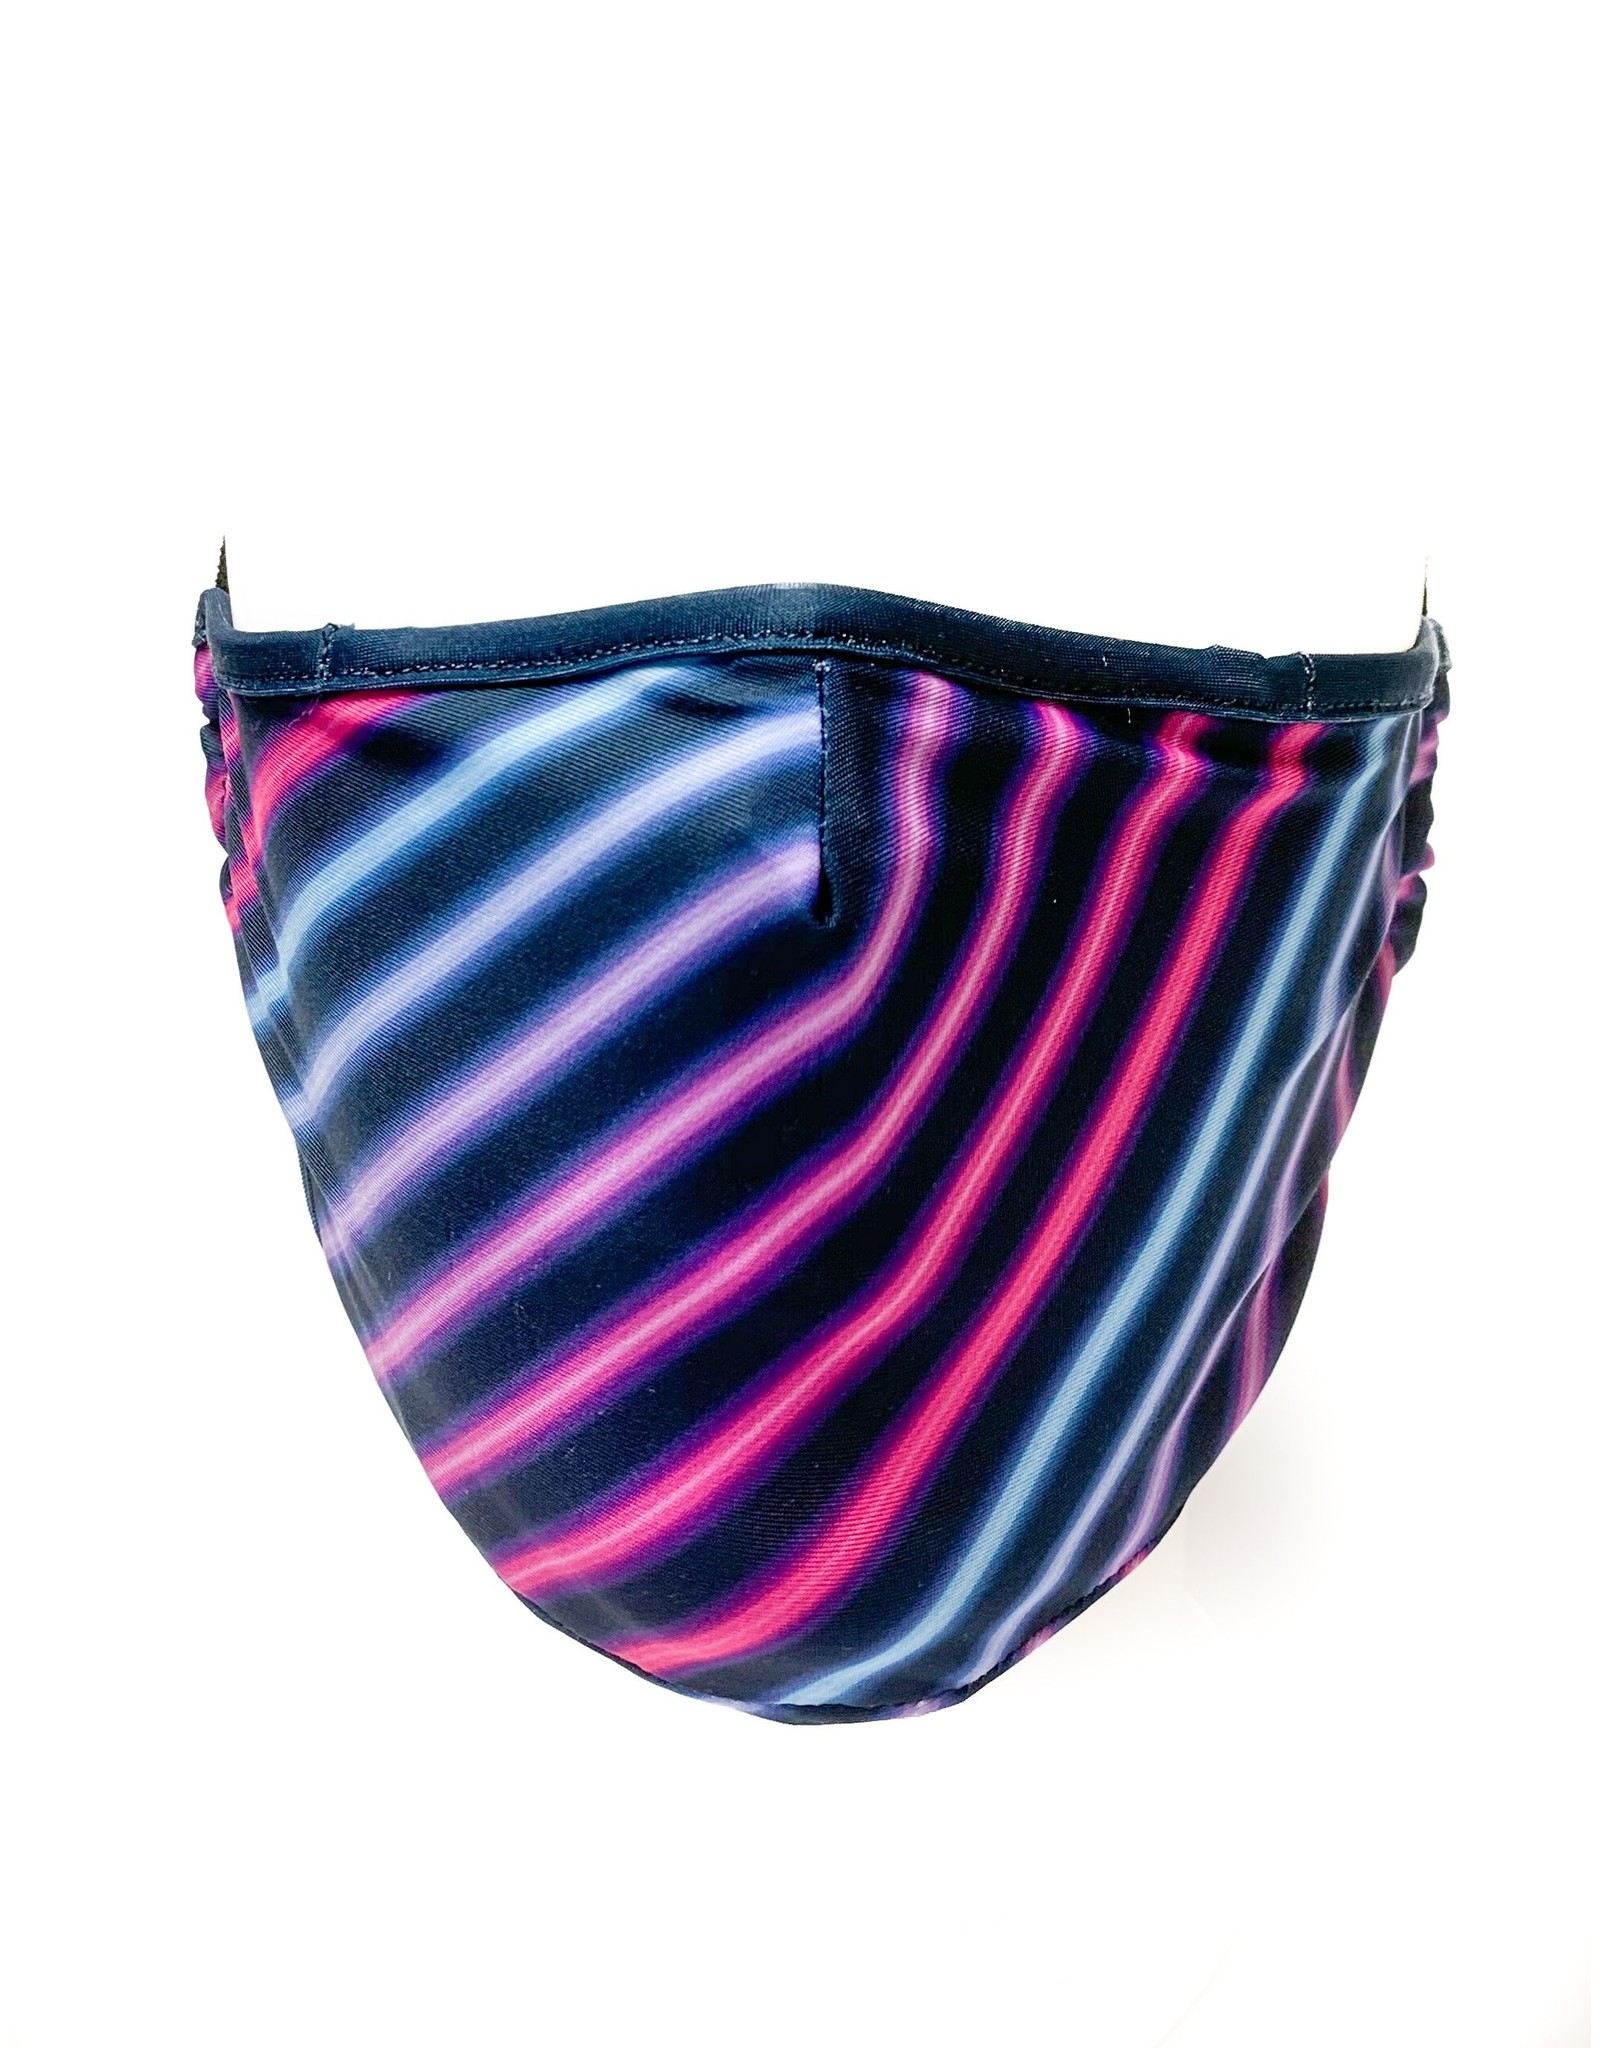 FYDELITY FYDELITY Face Mask - Miami Stripes